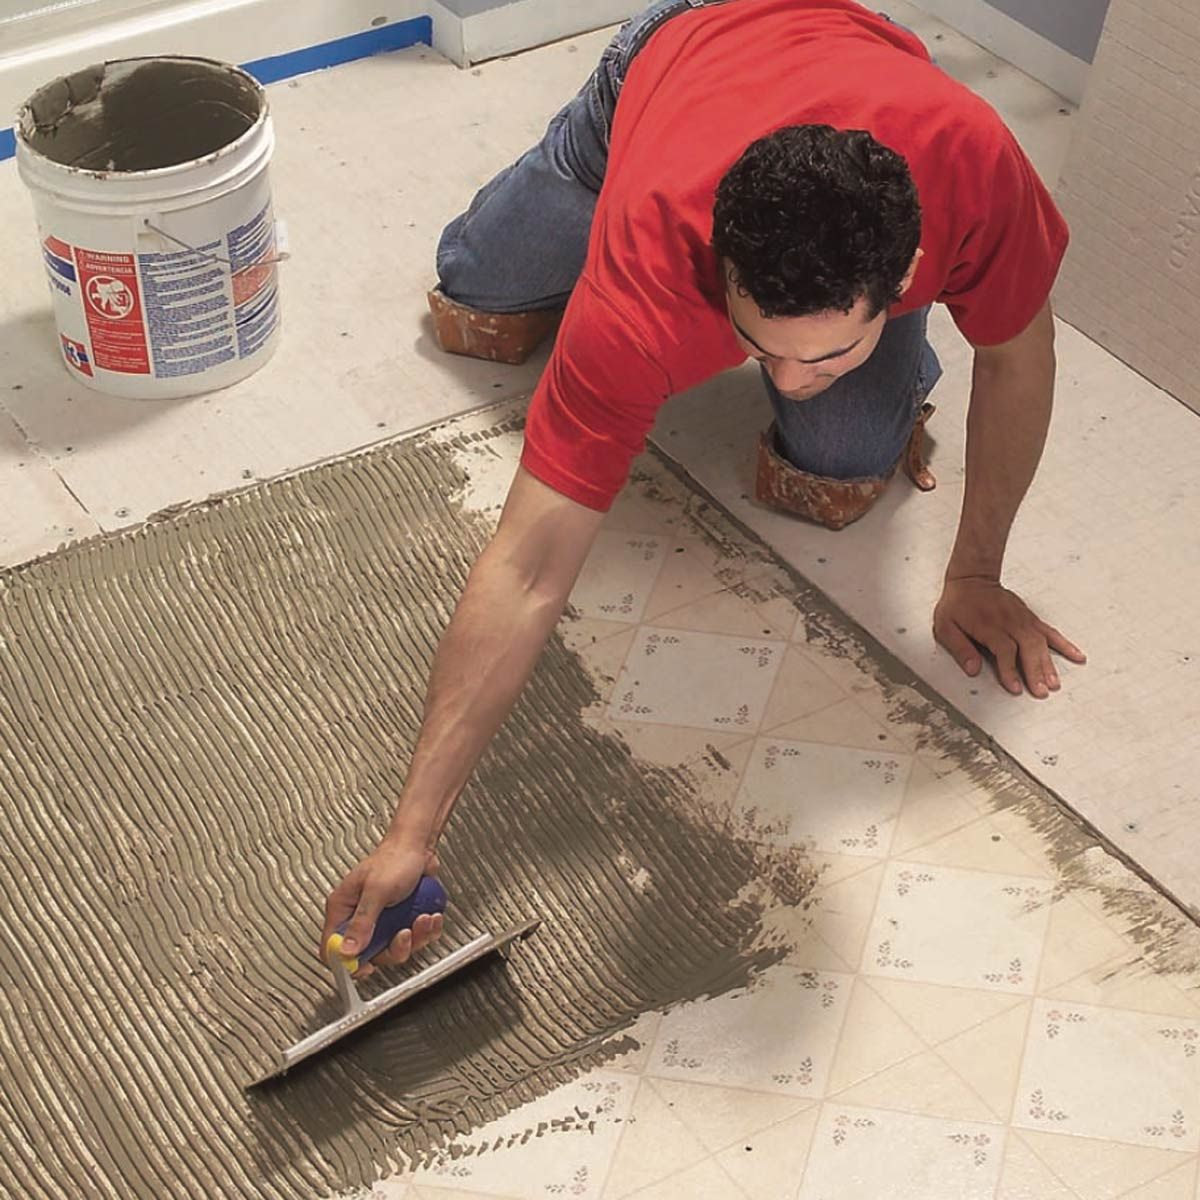 How To Install Ceramic Tile Floor In The Bathroom Ceramic Tile